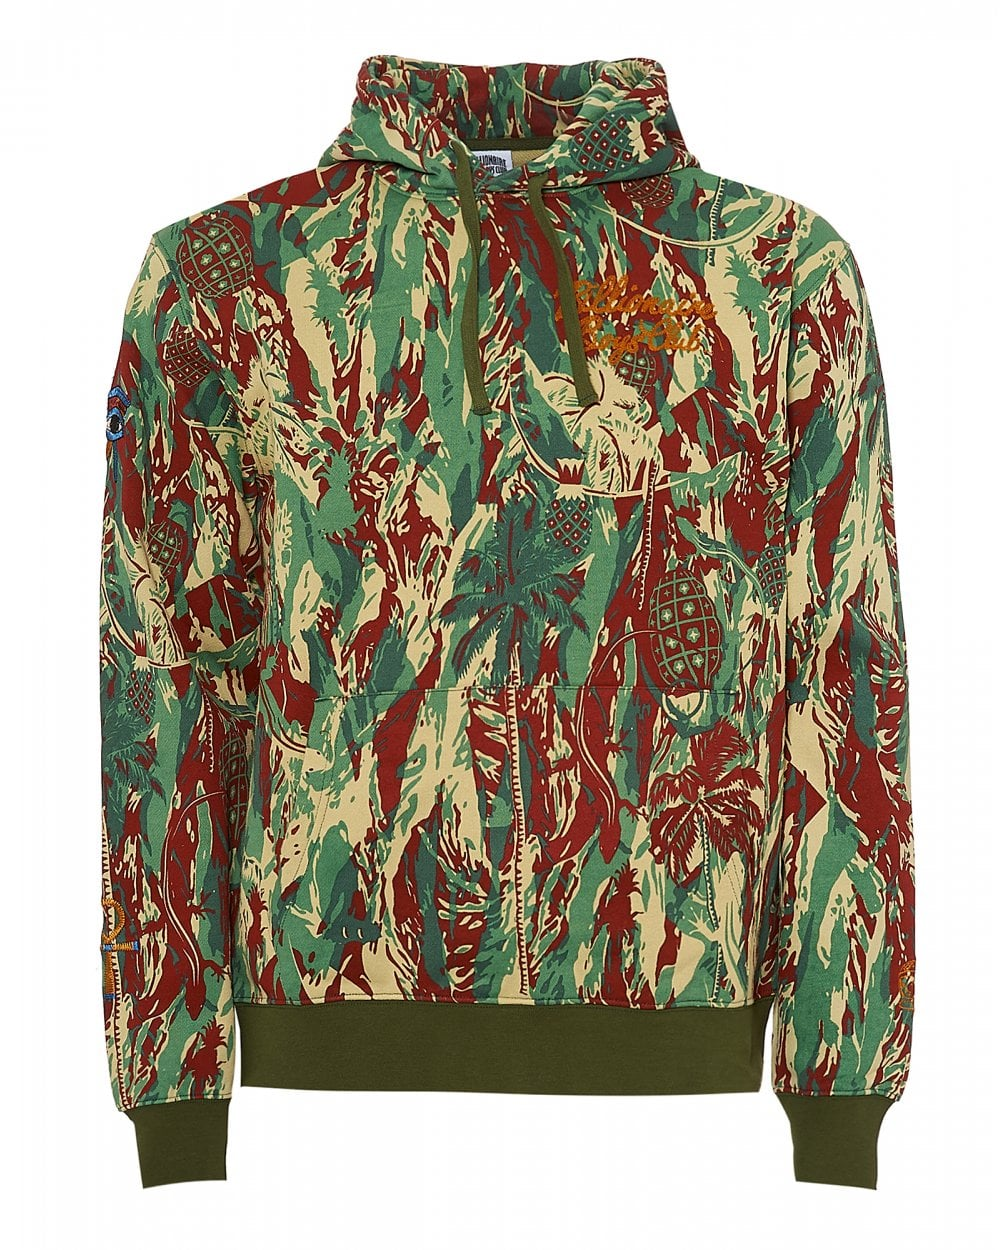 80289408 Mens Egypt Souvenir Hoodie, Camo Print Hooded Sweatshirt